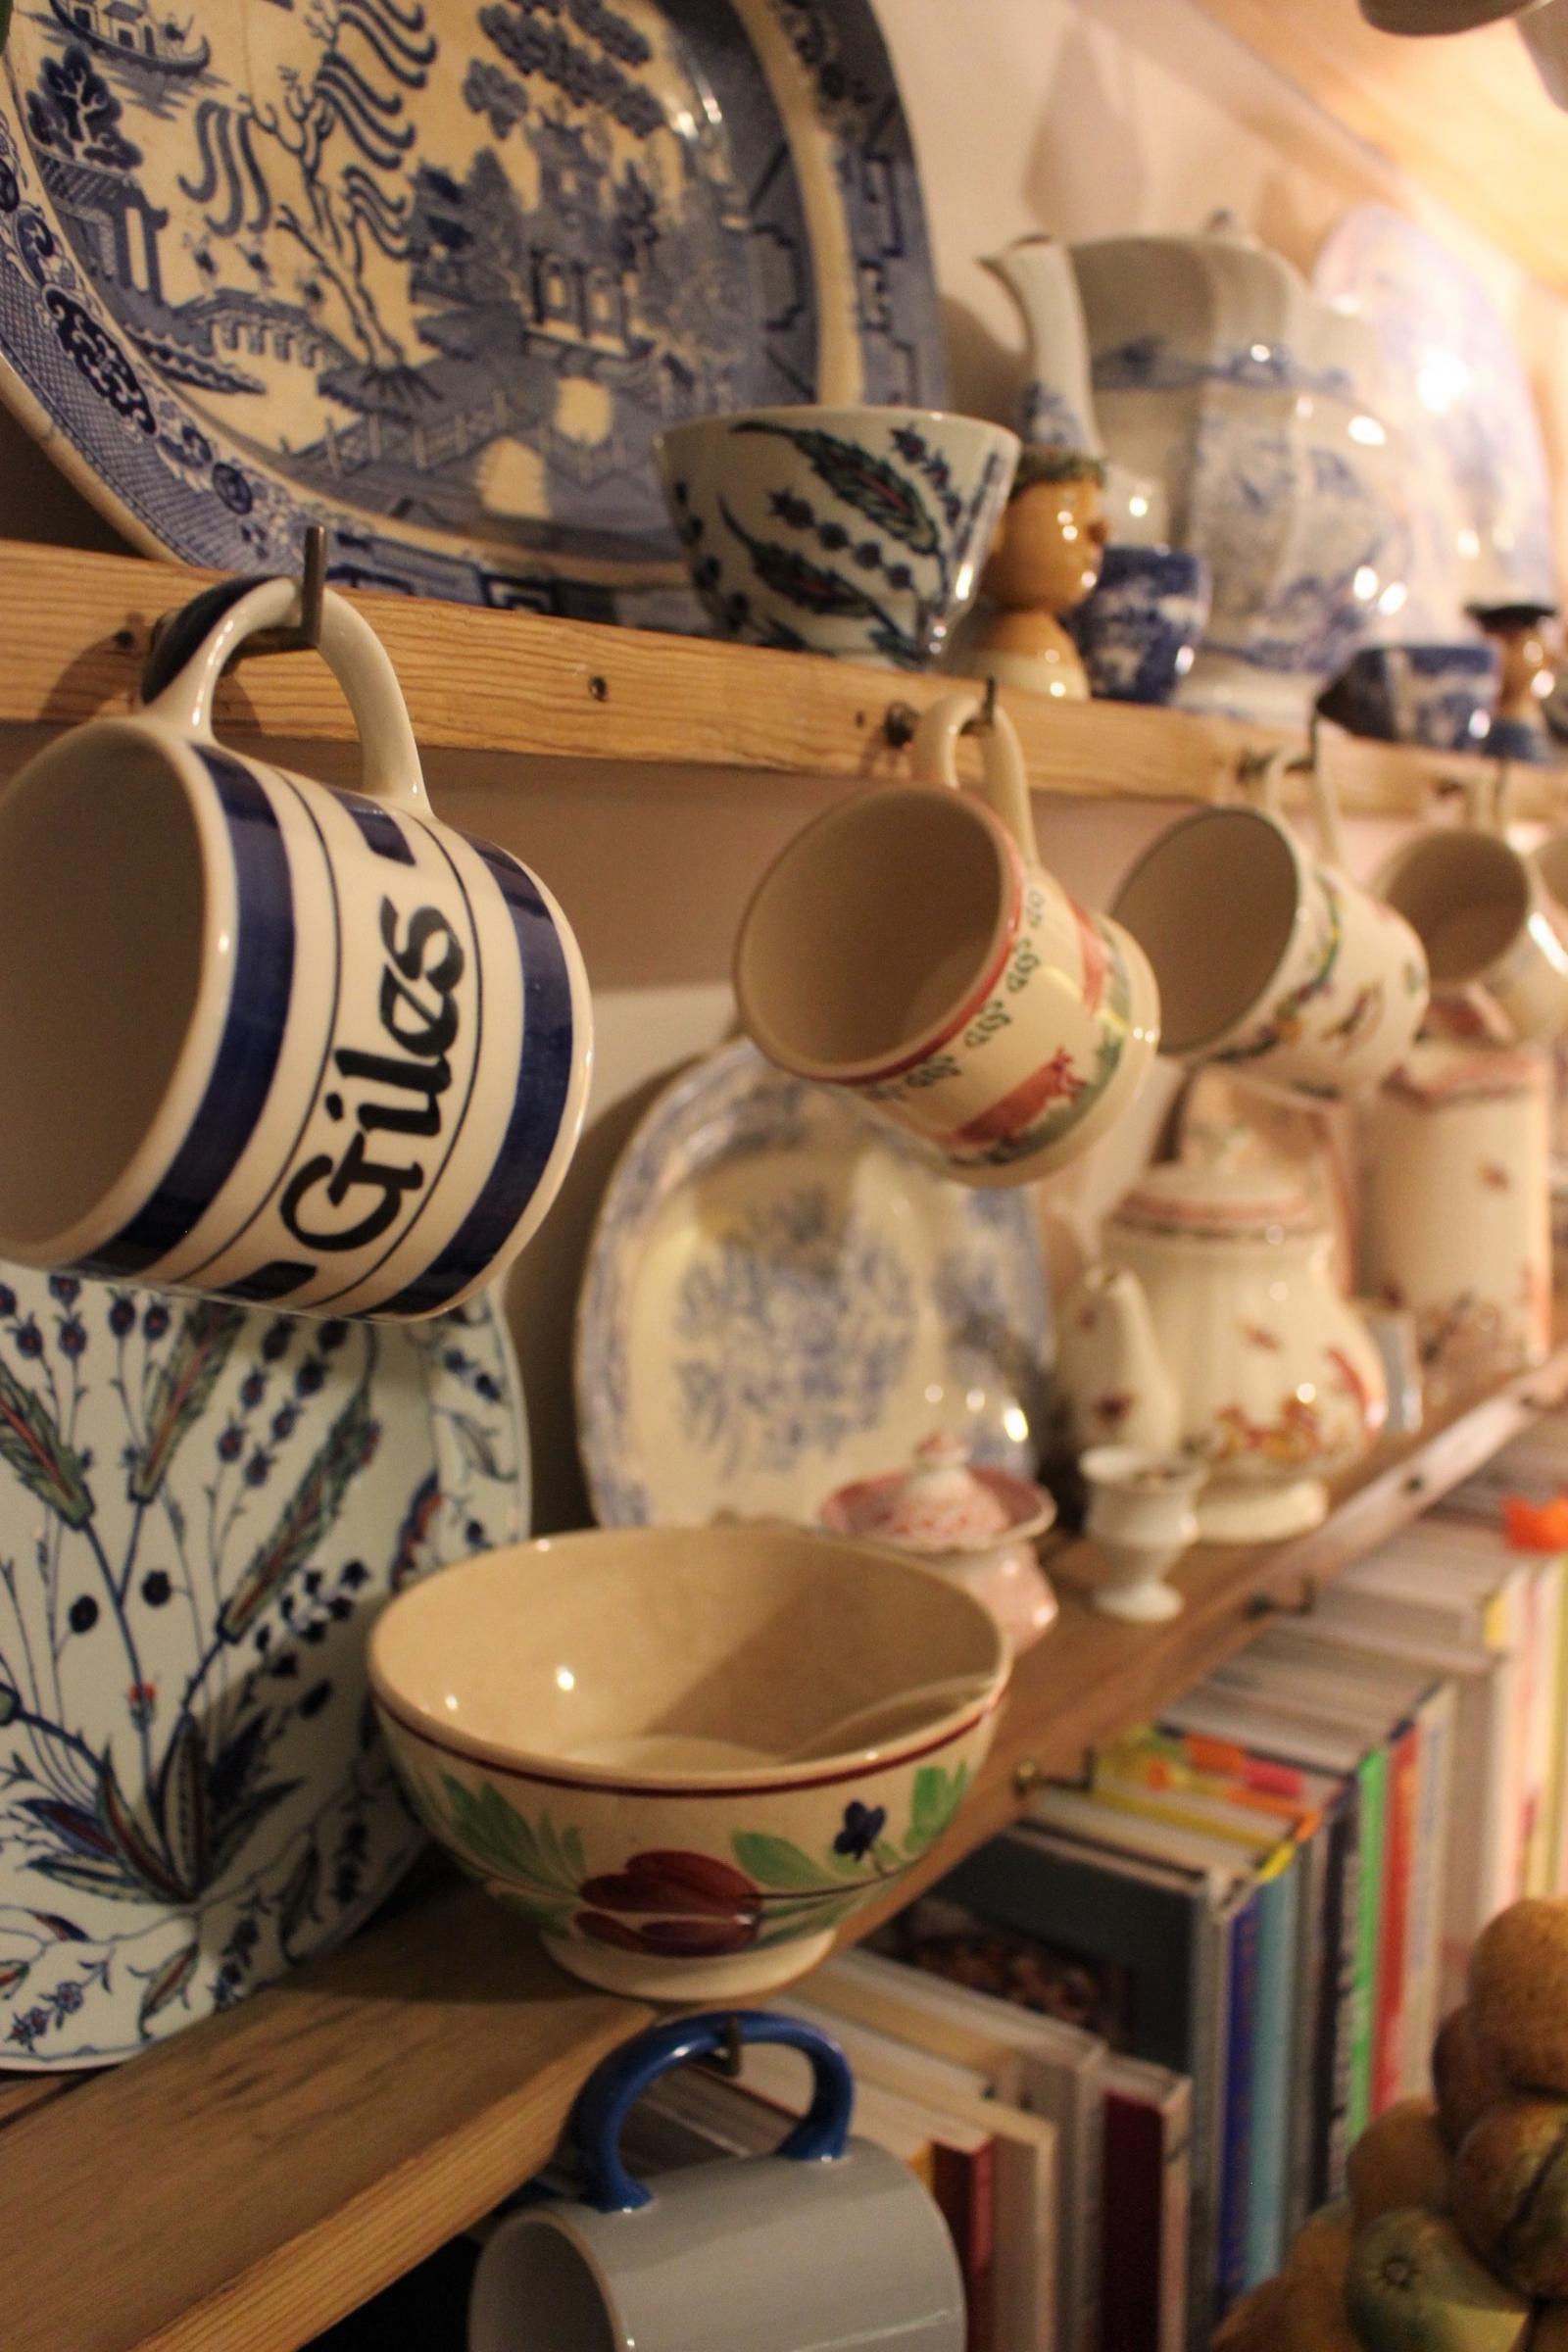 Kitchen Design Inspiration - wedding china and lovely mugs